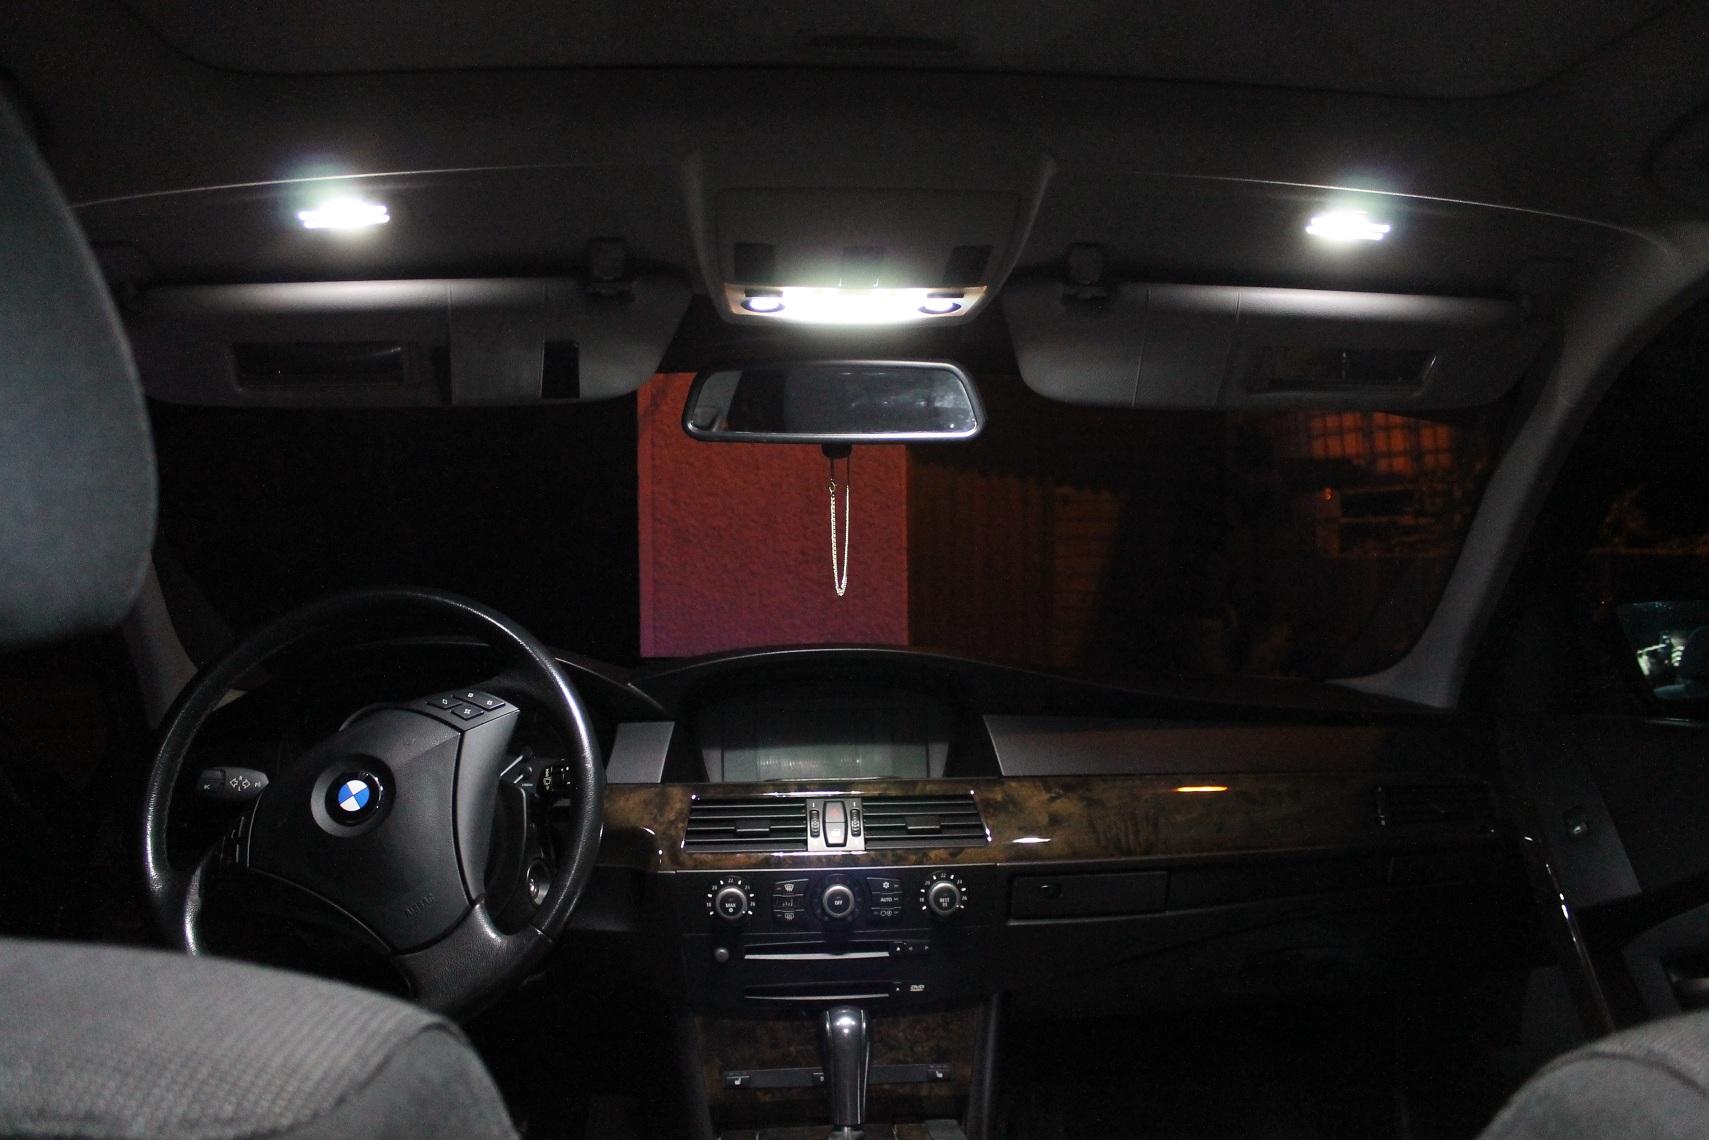 led innenraumbeleuchtung f r bmw e90 e91 e92. Black Bedroom Furniture Sets. Home Design Ideas